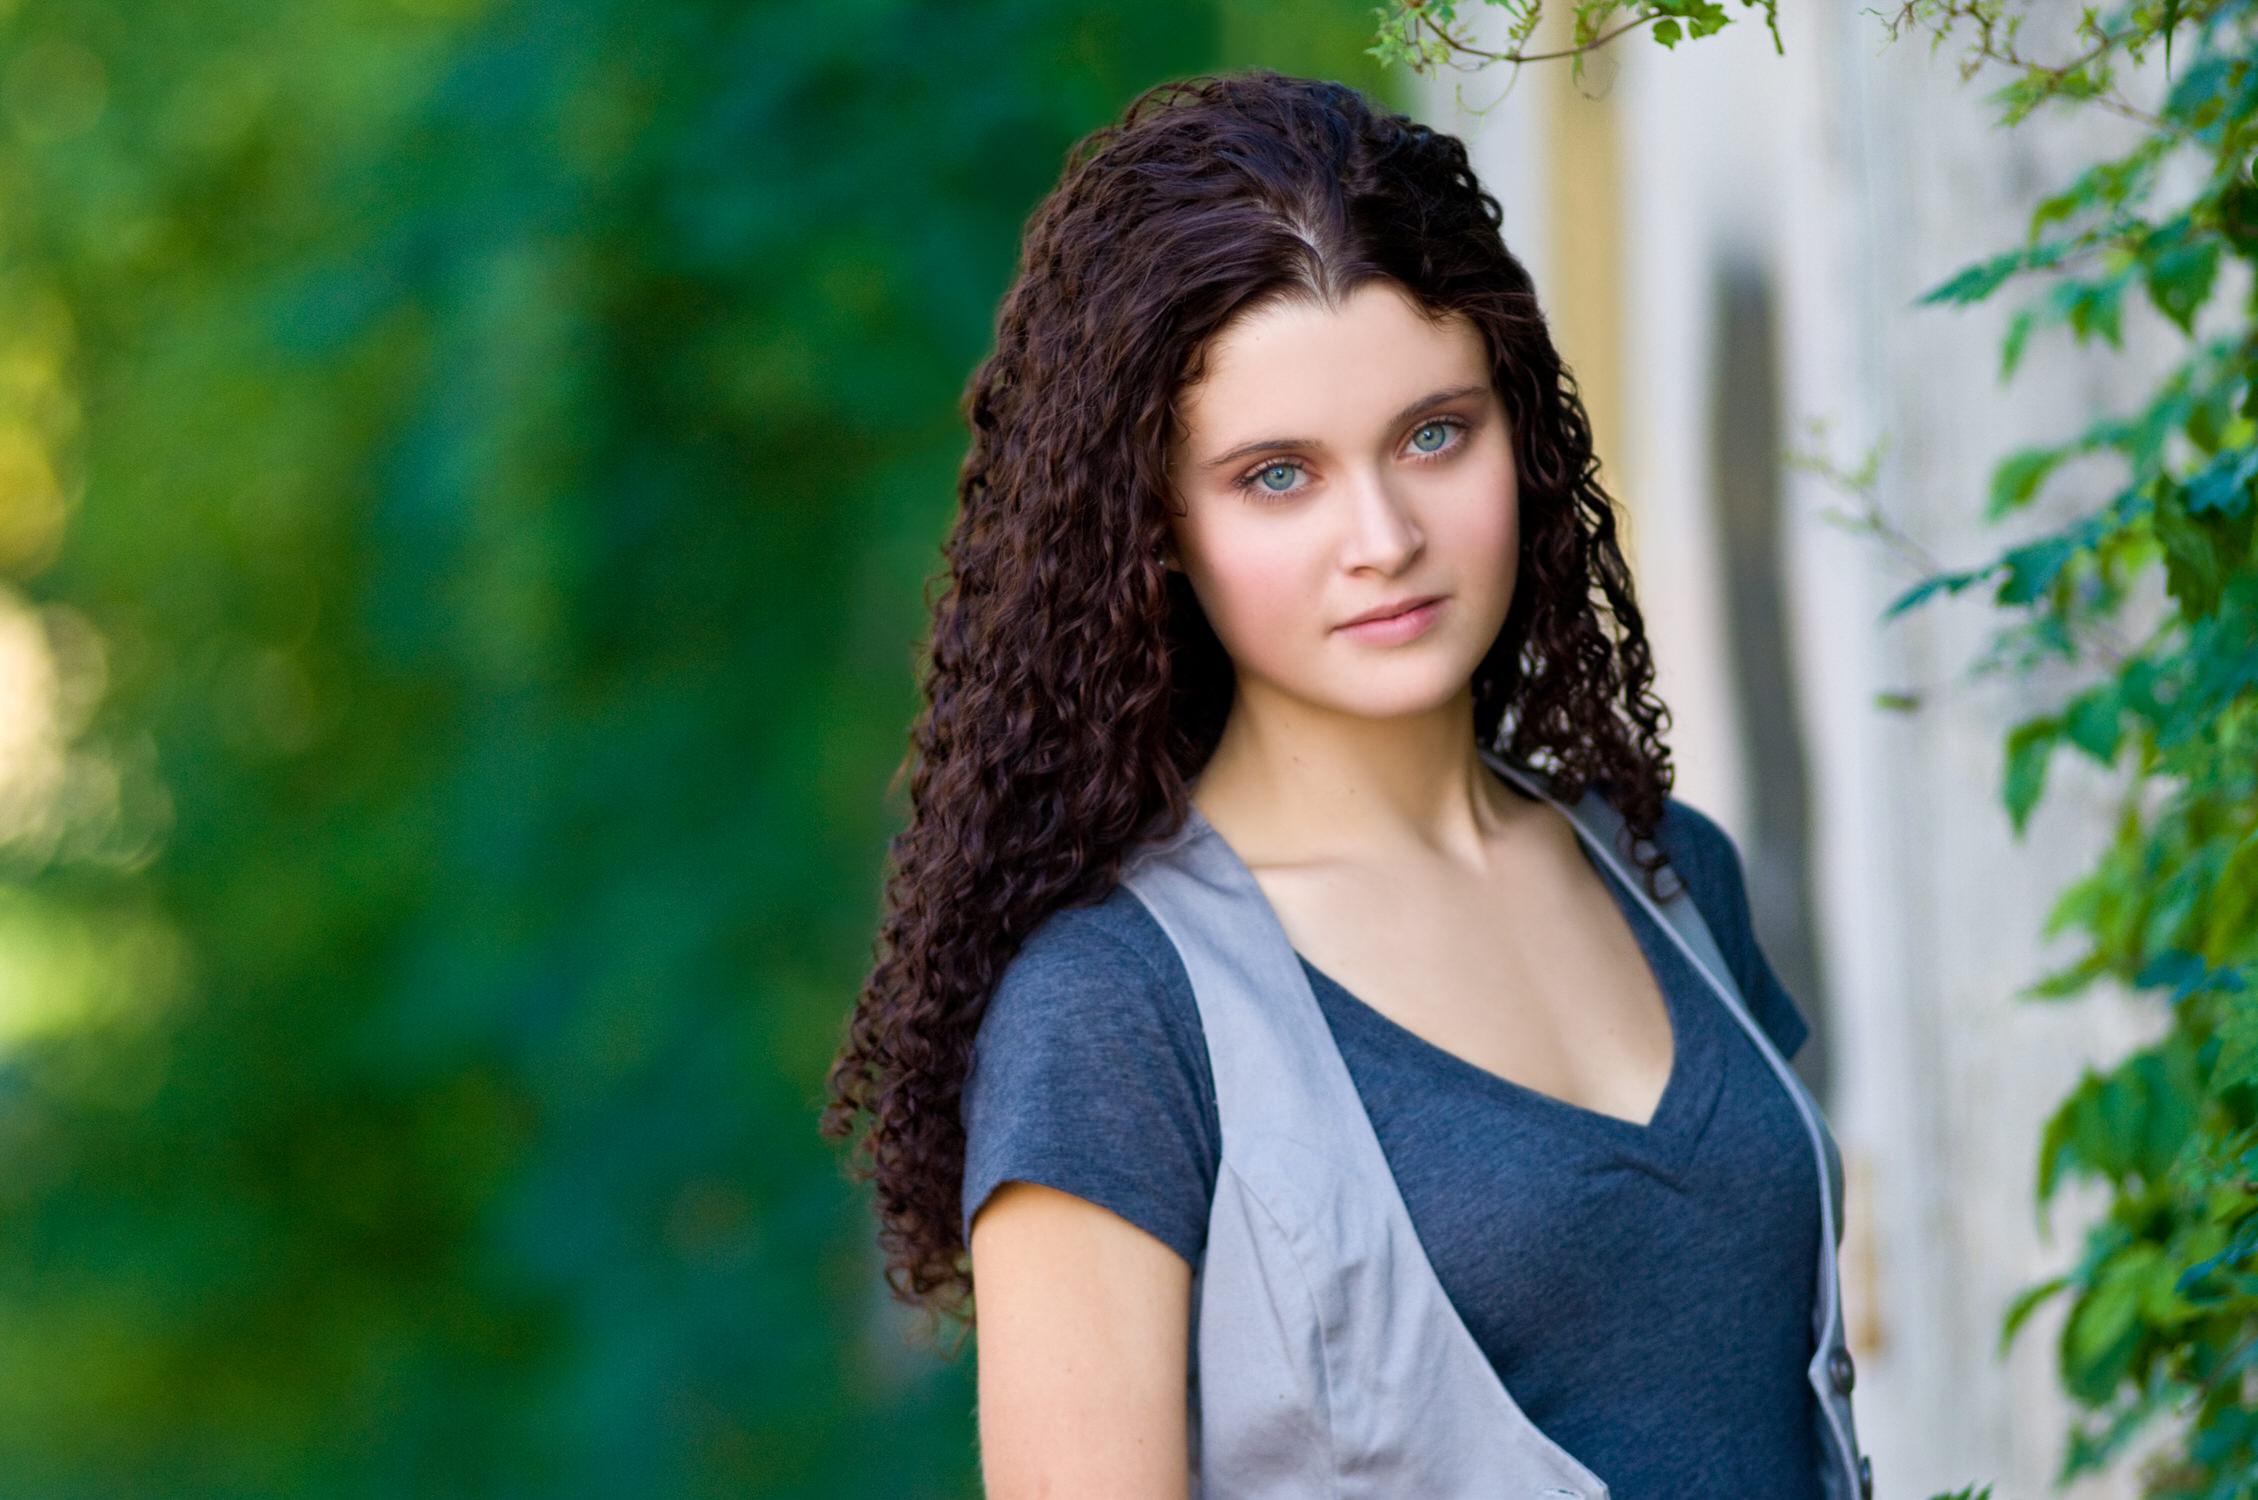 Kim-Riley-Portraitr-Editorial-Advertising-Best-Top-teens-Photography-school-lifestyle-Photographer-Houston-Texas-Kingwood-Talley-Tobin-McSwain-4.jpg